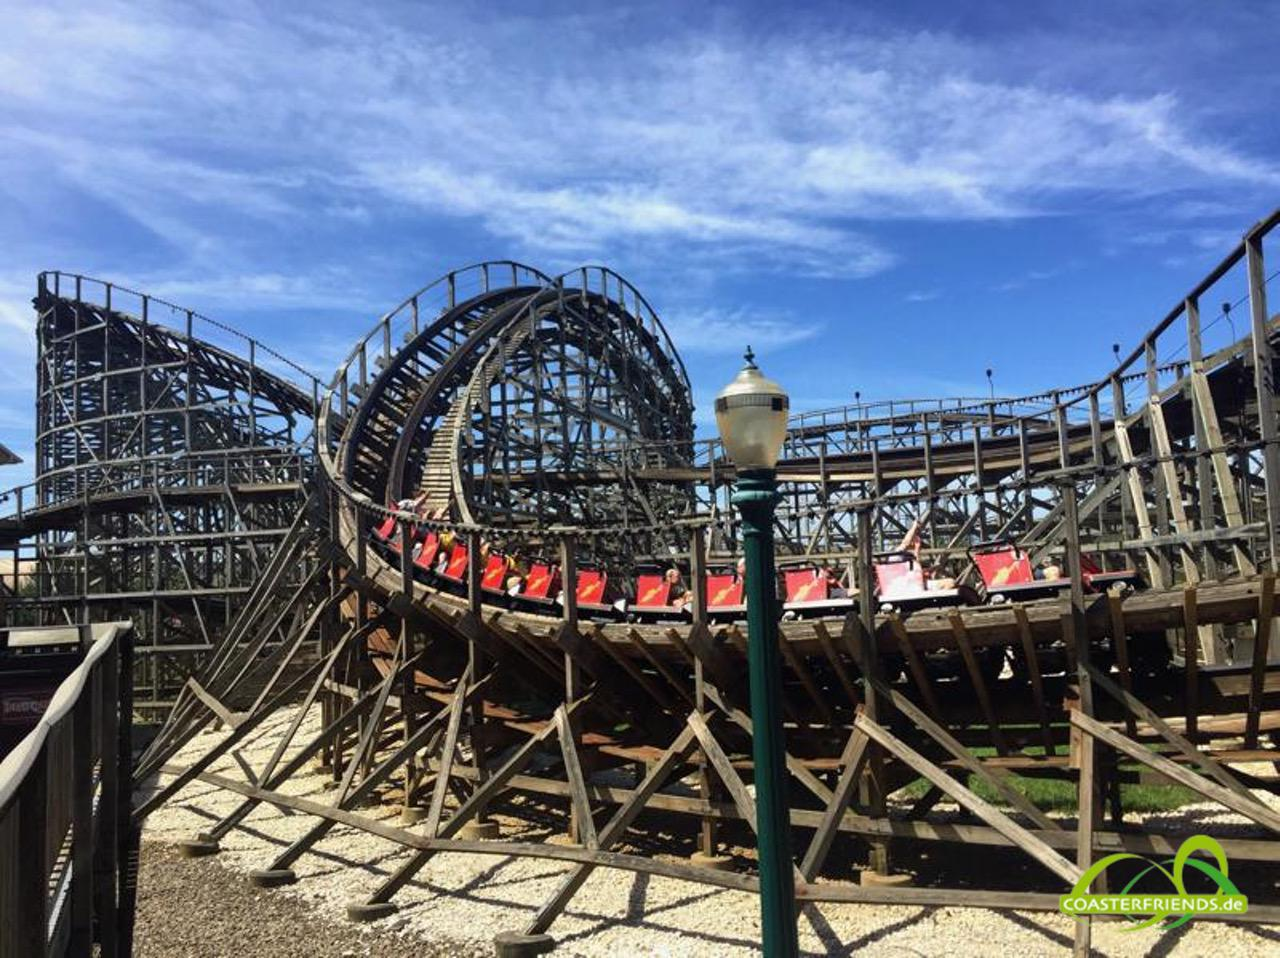 Nordamerika - https://coasterfriends.de/joomla//images/pcp_parkdetails/nordamerika/o1212_hersheypark/content2.jpg